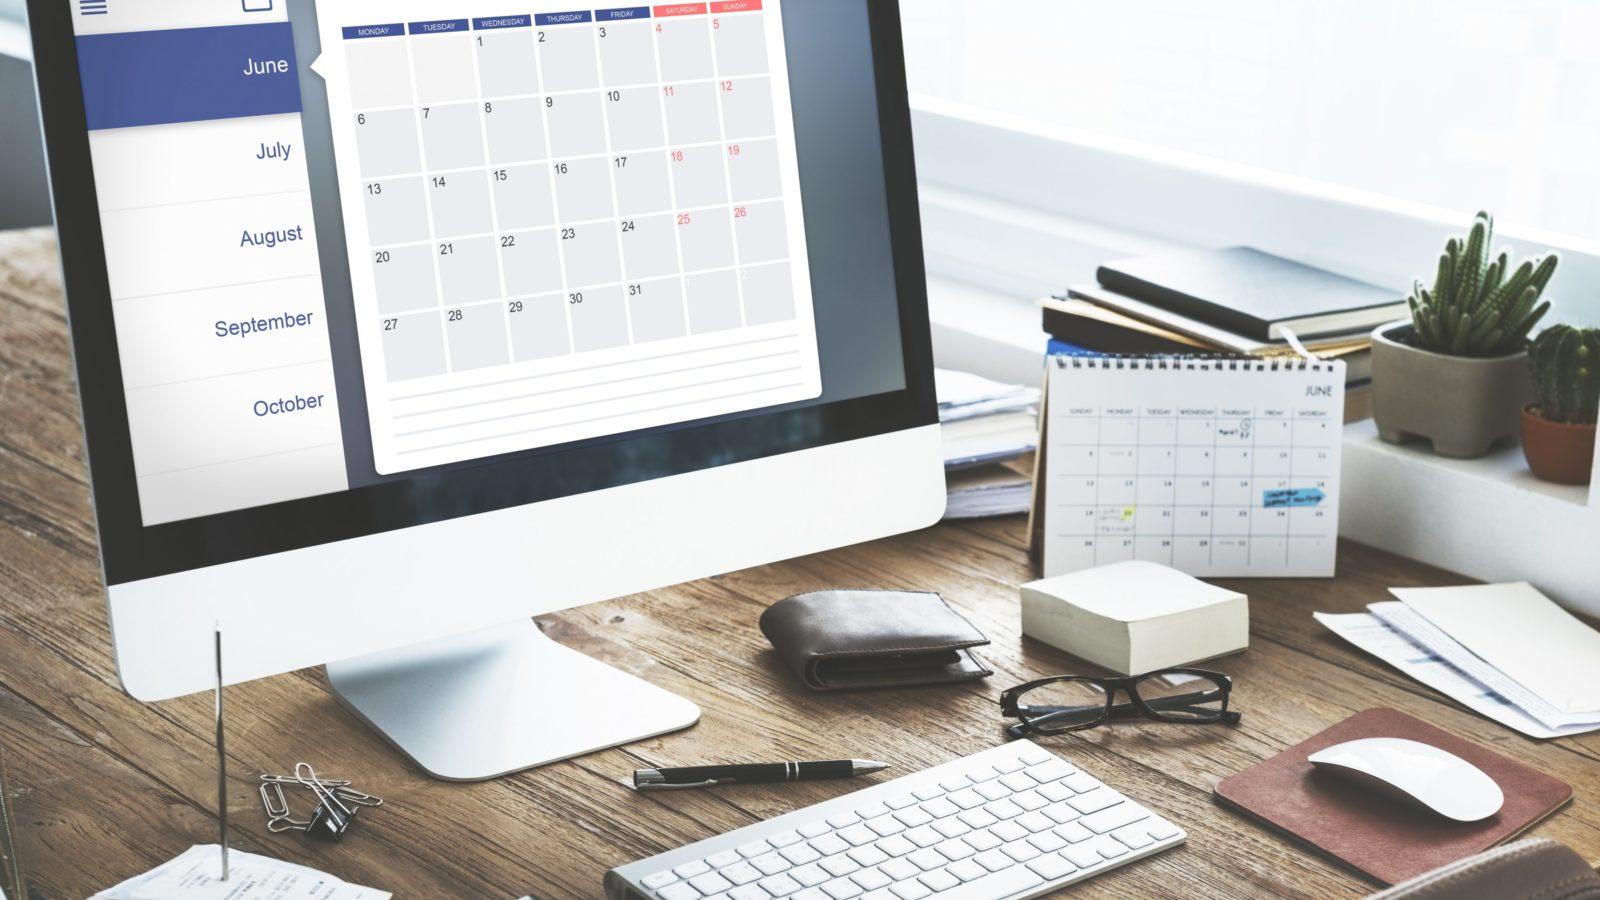 Mac displaying calendar